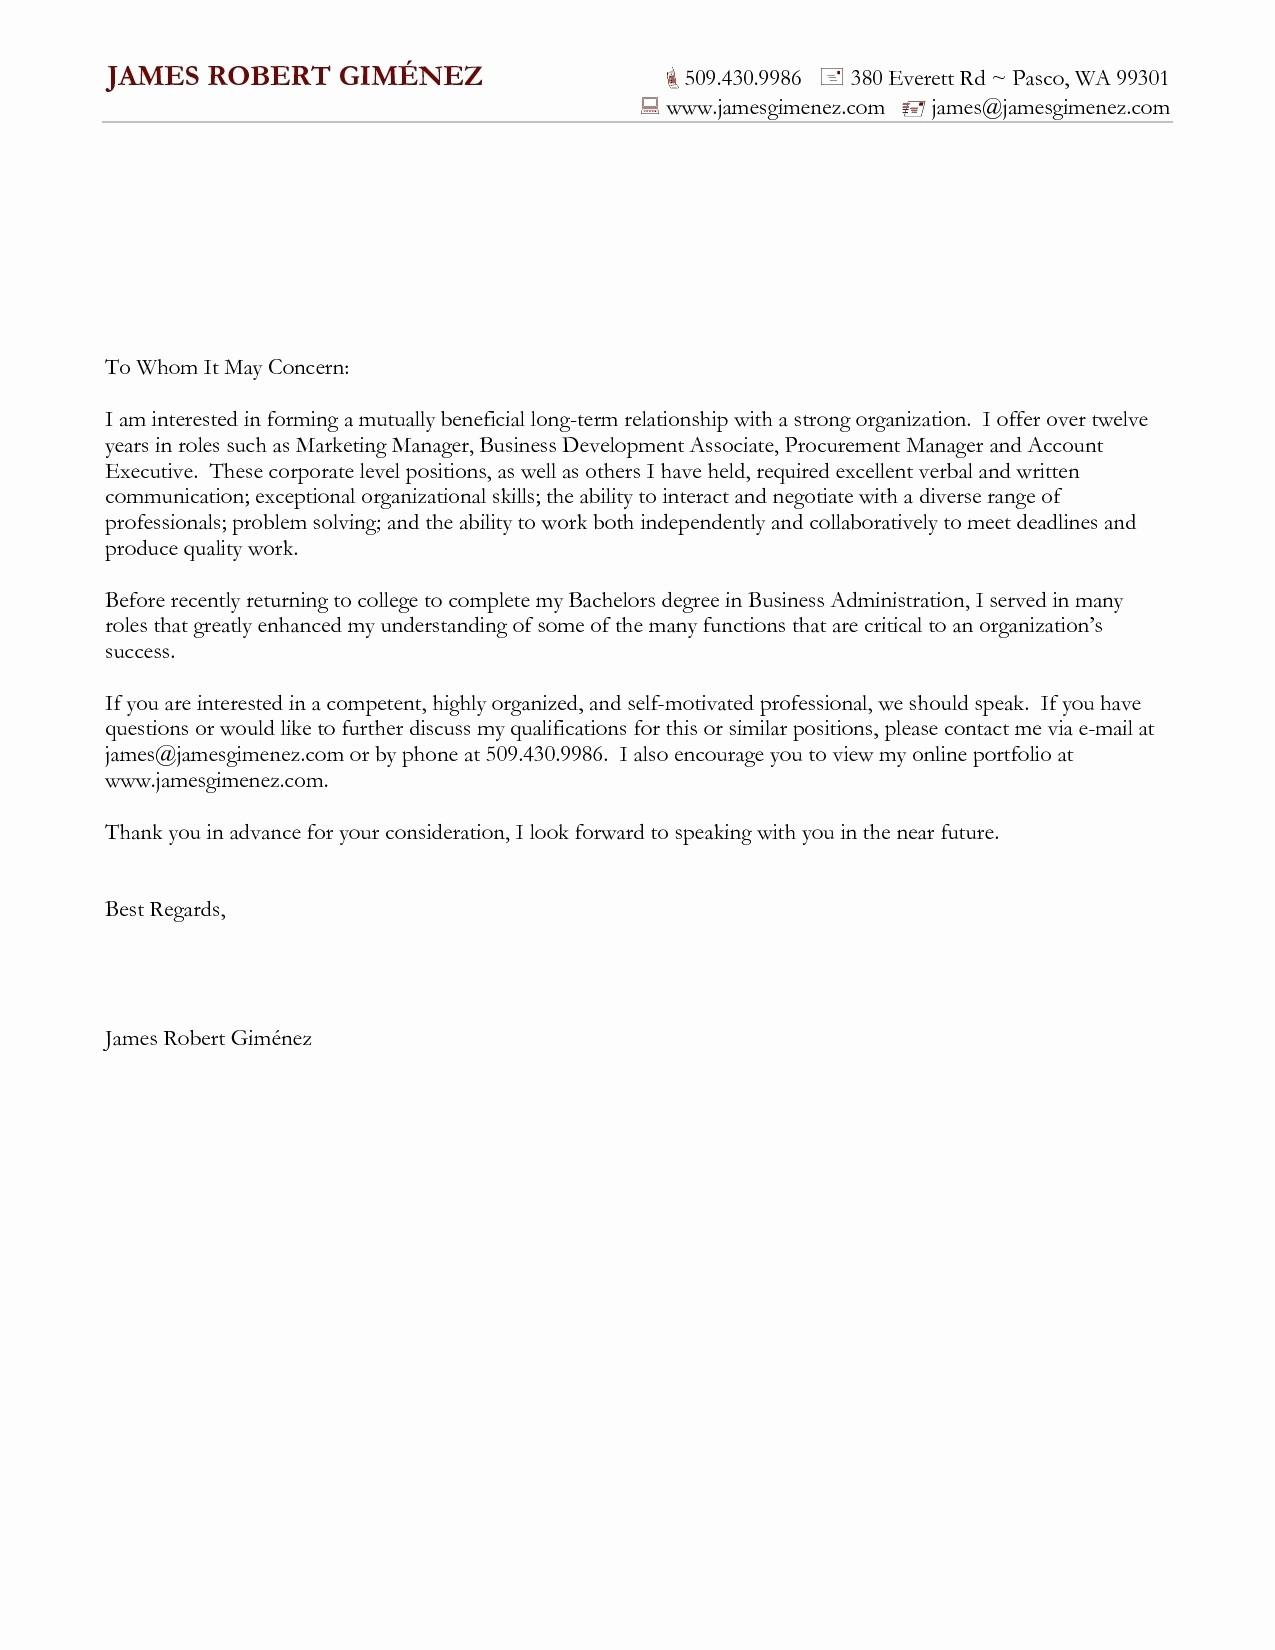 Cover Letter On A Resume Fresh Mock Cover Letter